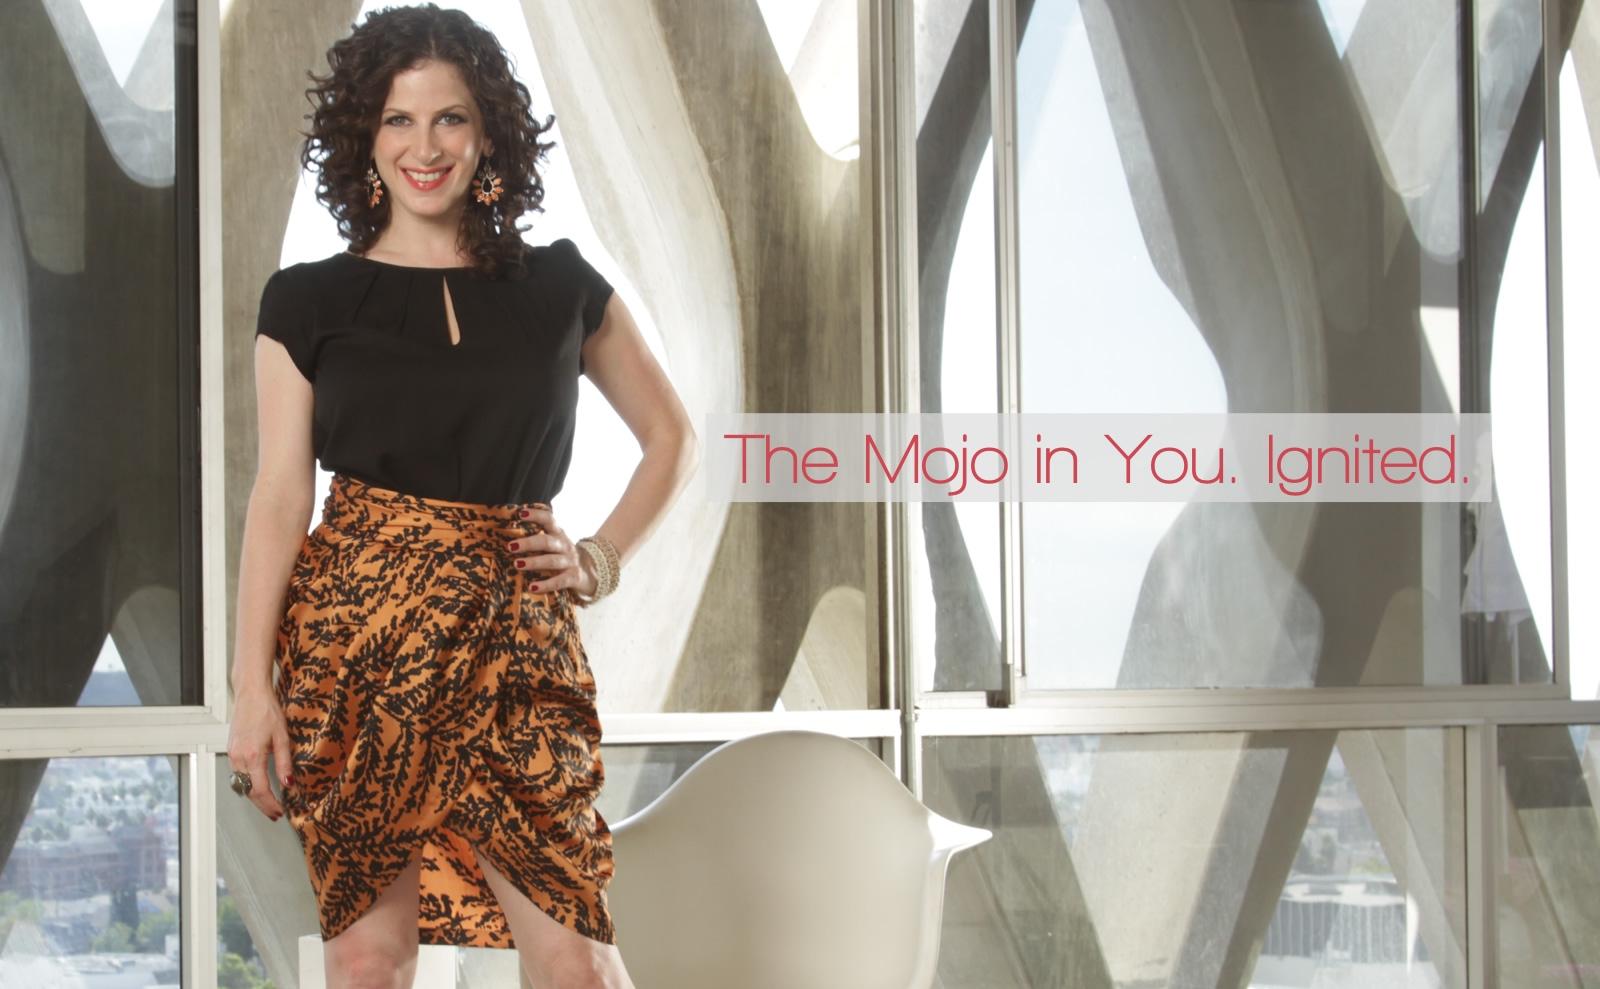 Deborah Kagan. The Mojo in You. Ignited.